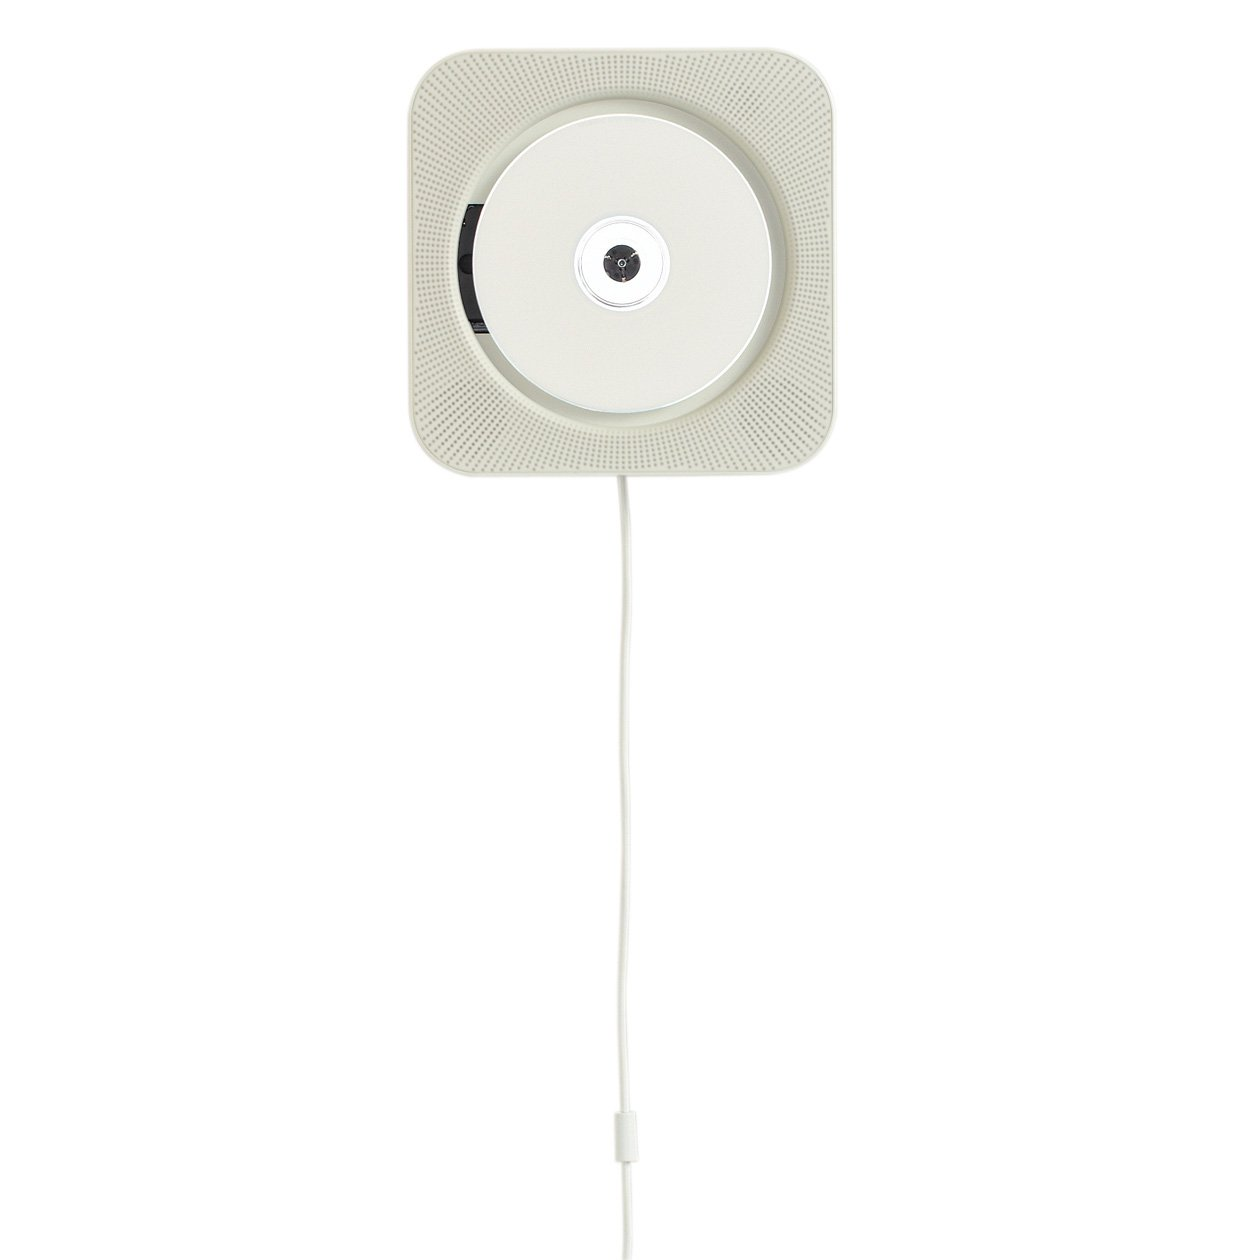 MUJI Moma Wall Mounted CD Player CPD-3 with FM Radio by Muji